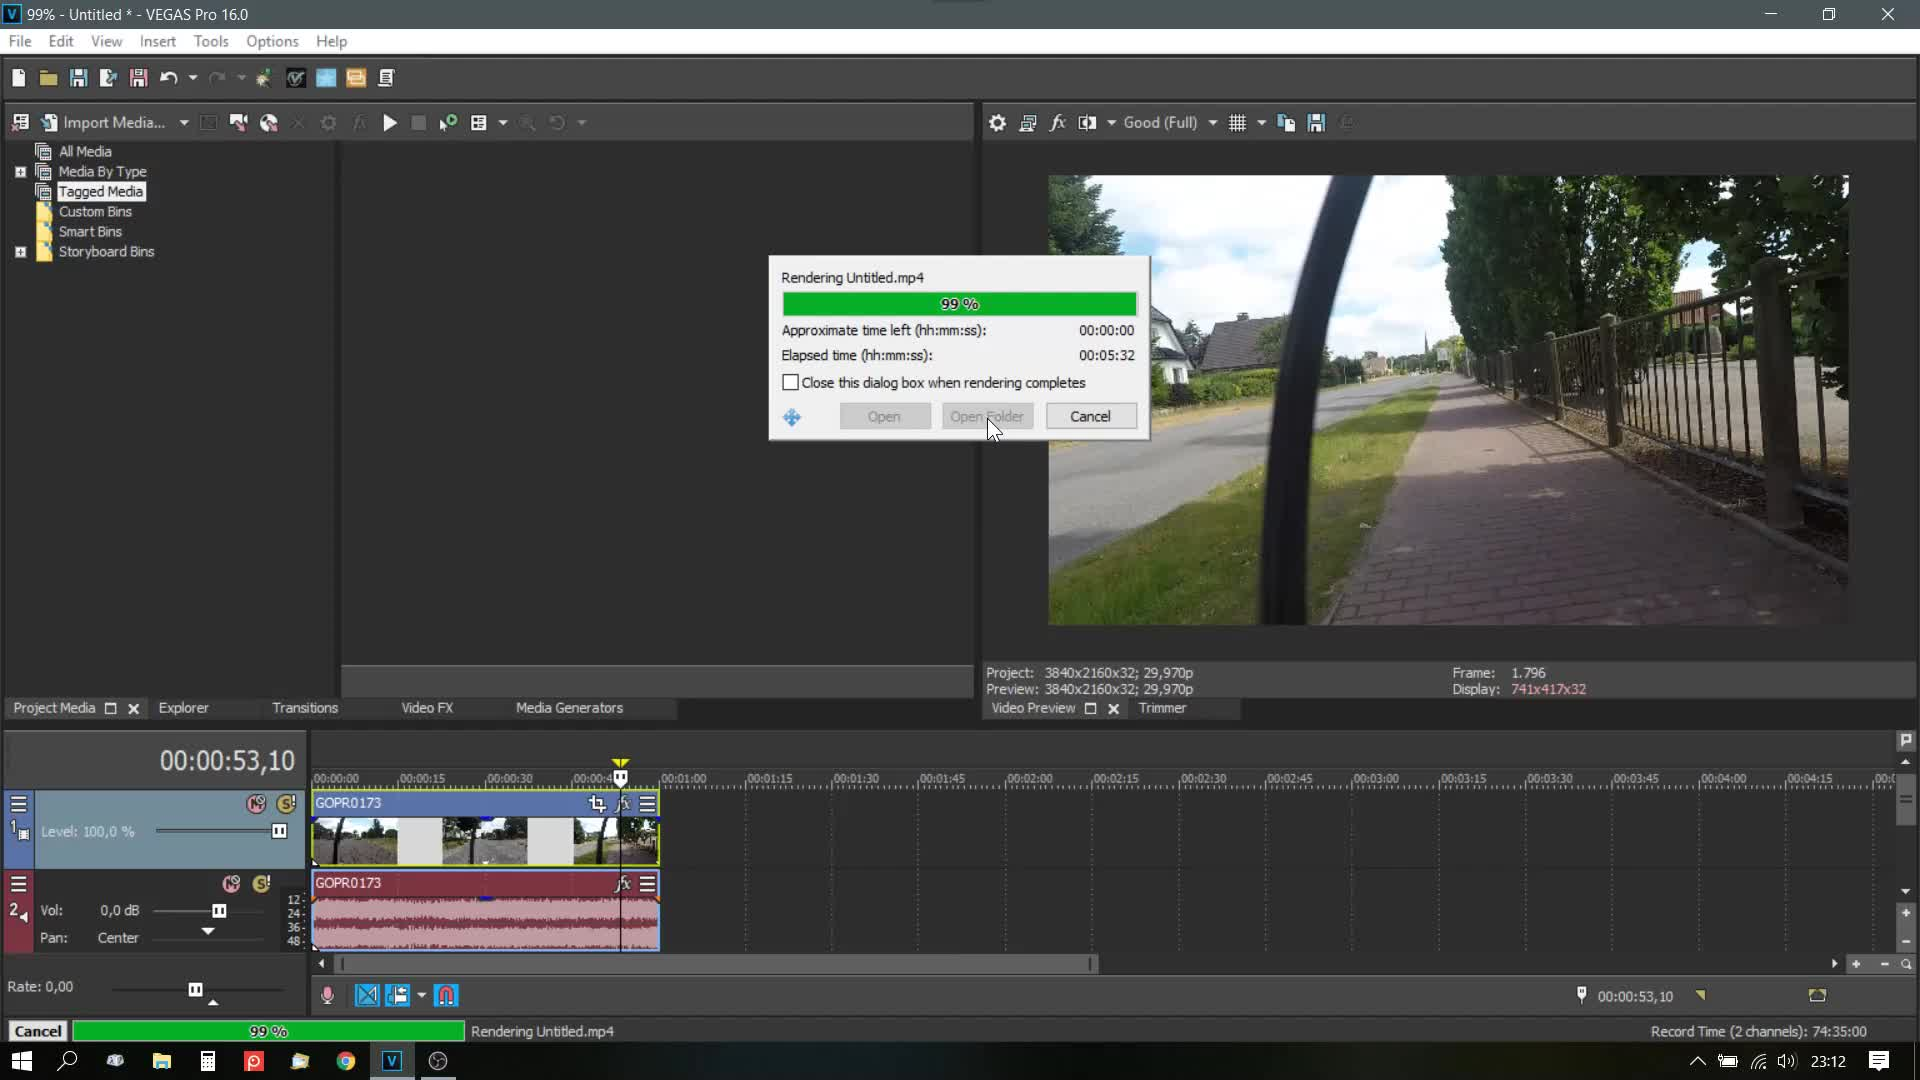 Vegas Pro 16 keeps rendering 0 byte files